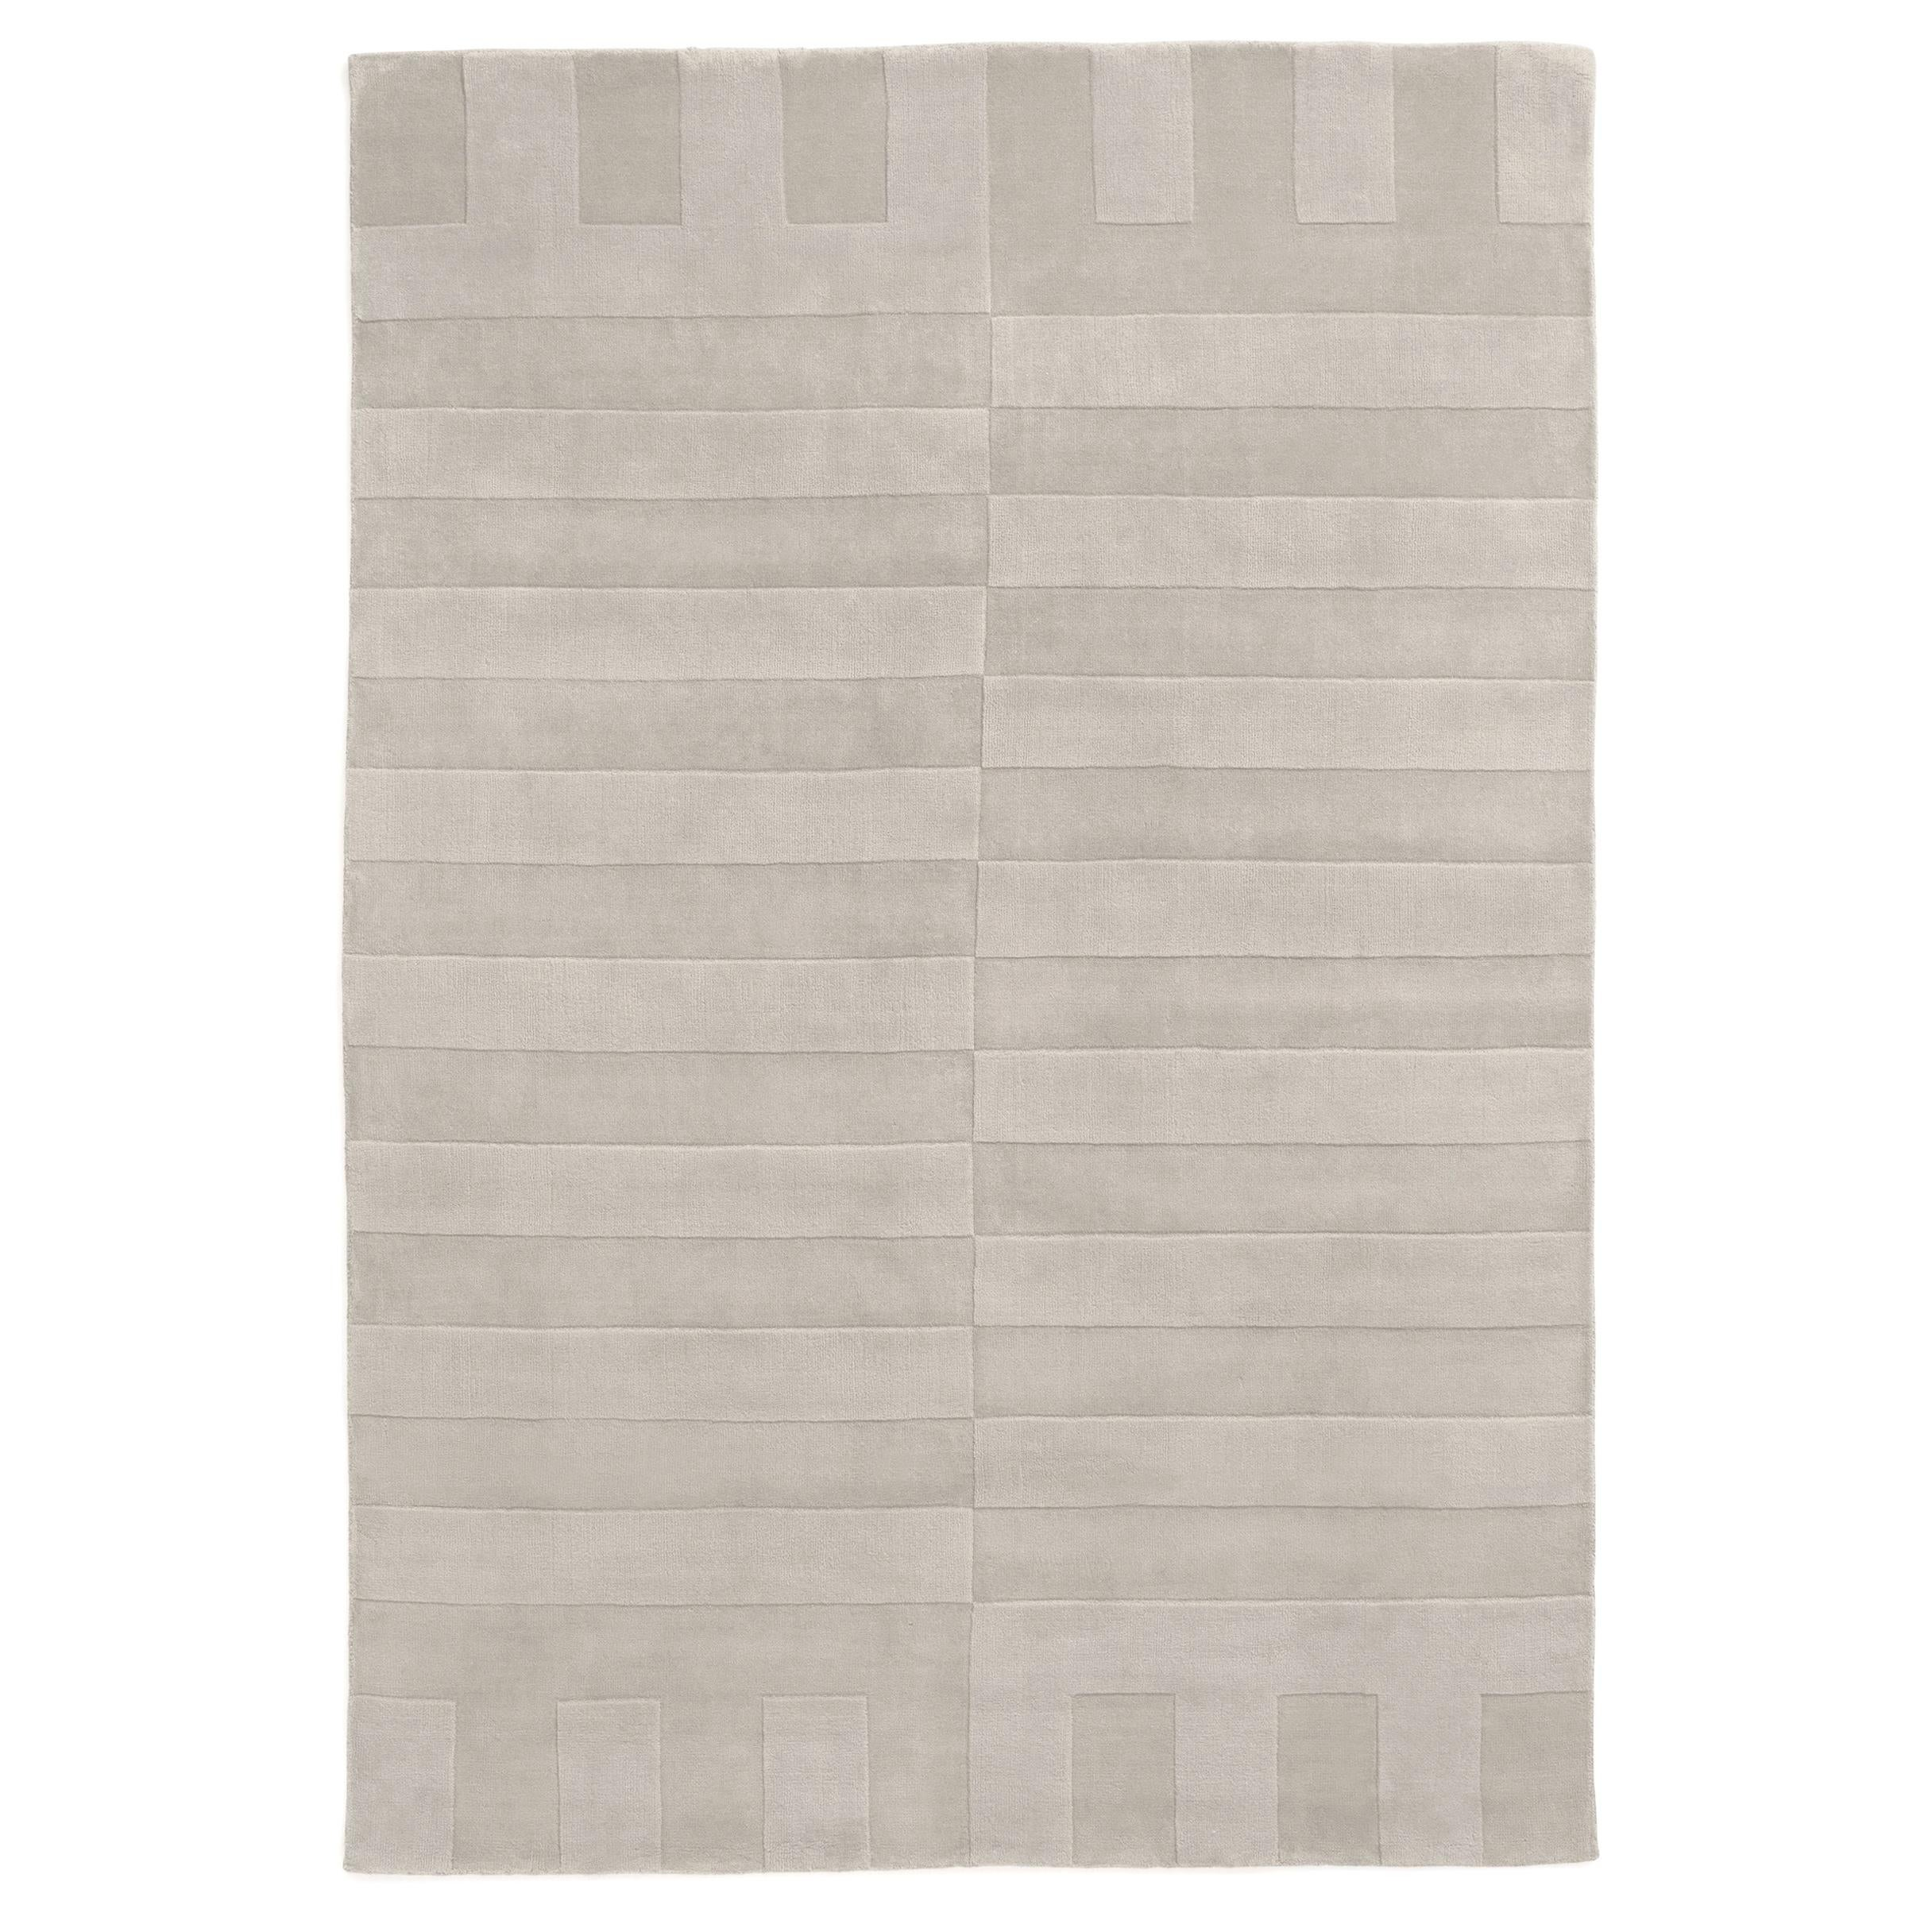 Lux 2 Oatmeal, Wool Cut Pile Rug in Scandinavian Design